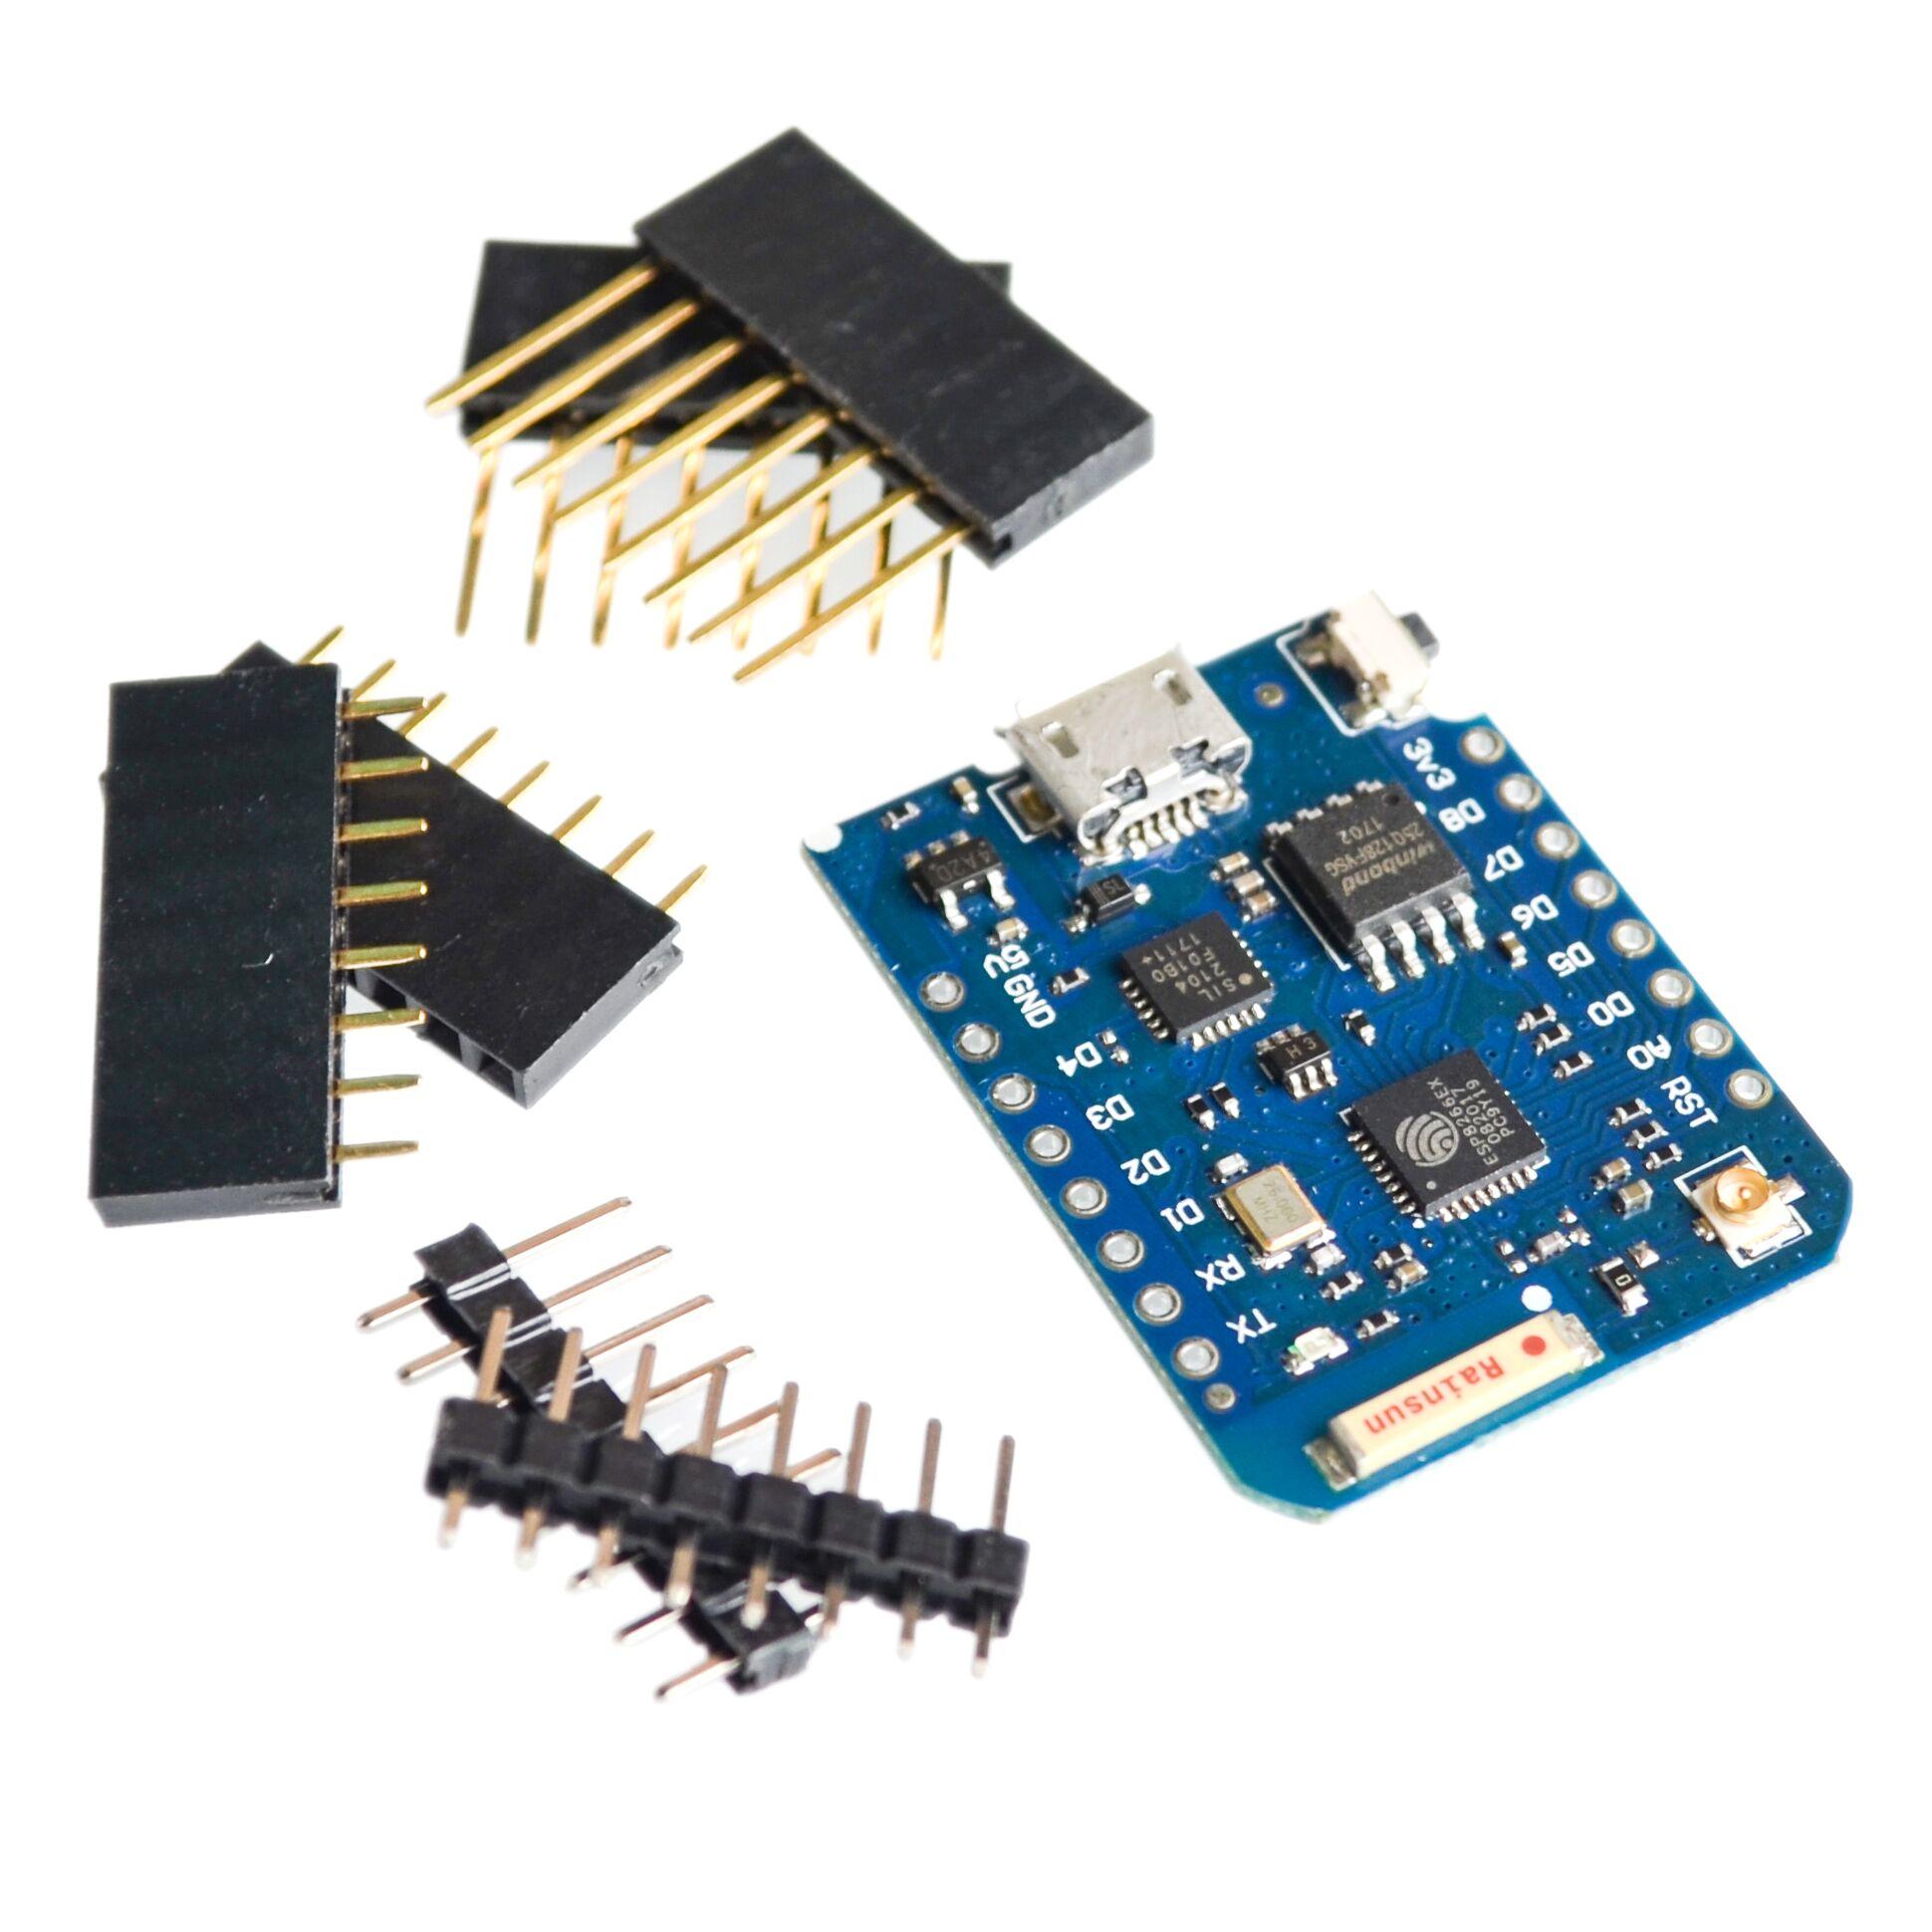 Temperature and humidity sensor transmitter 4 20MA 0 5V 0 10V RS485 output waterproof digital led